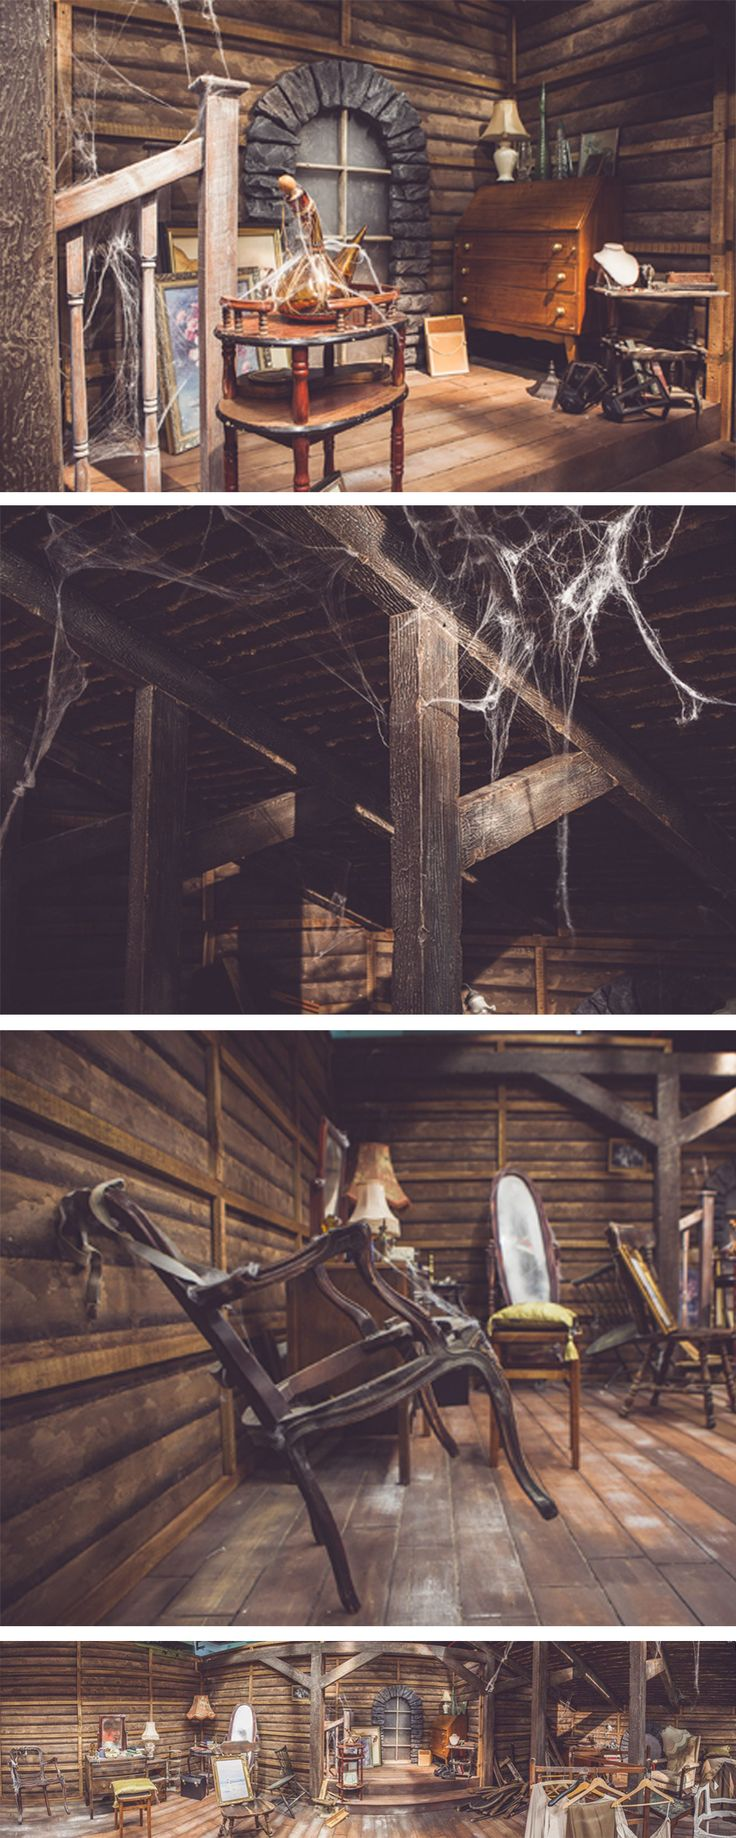 34 Best Images About Film T V Set Construction On